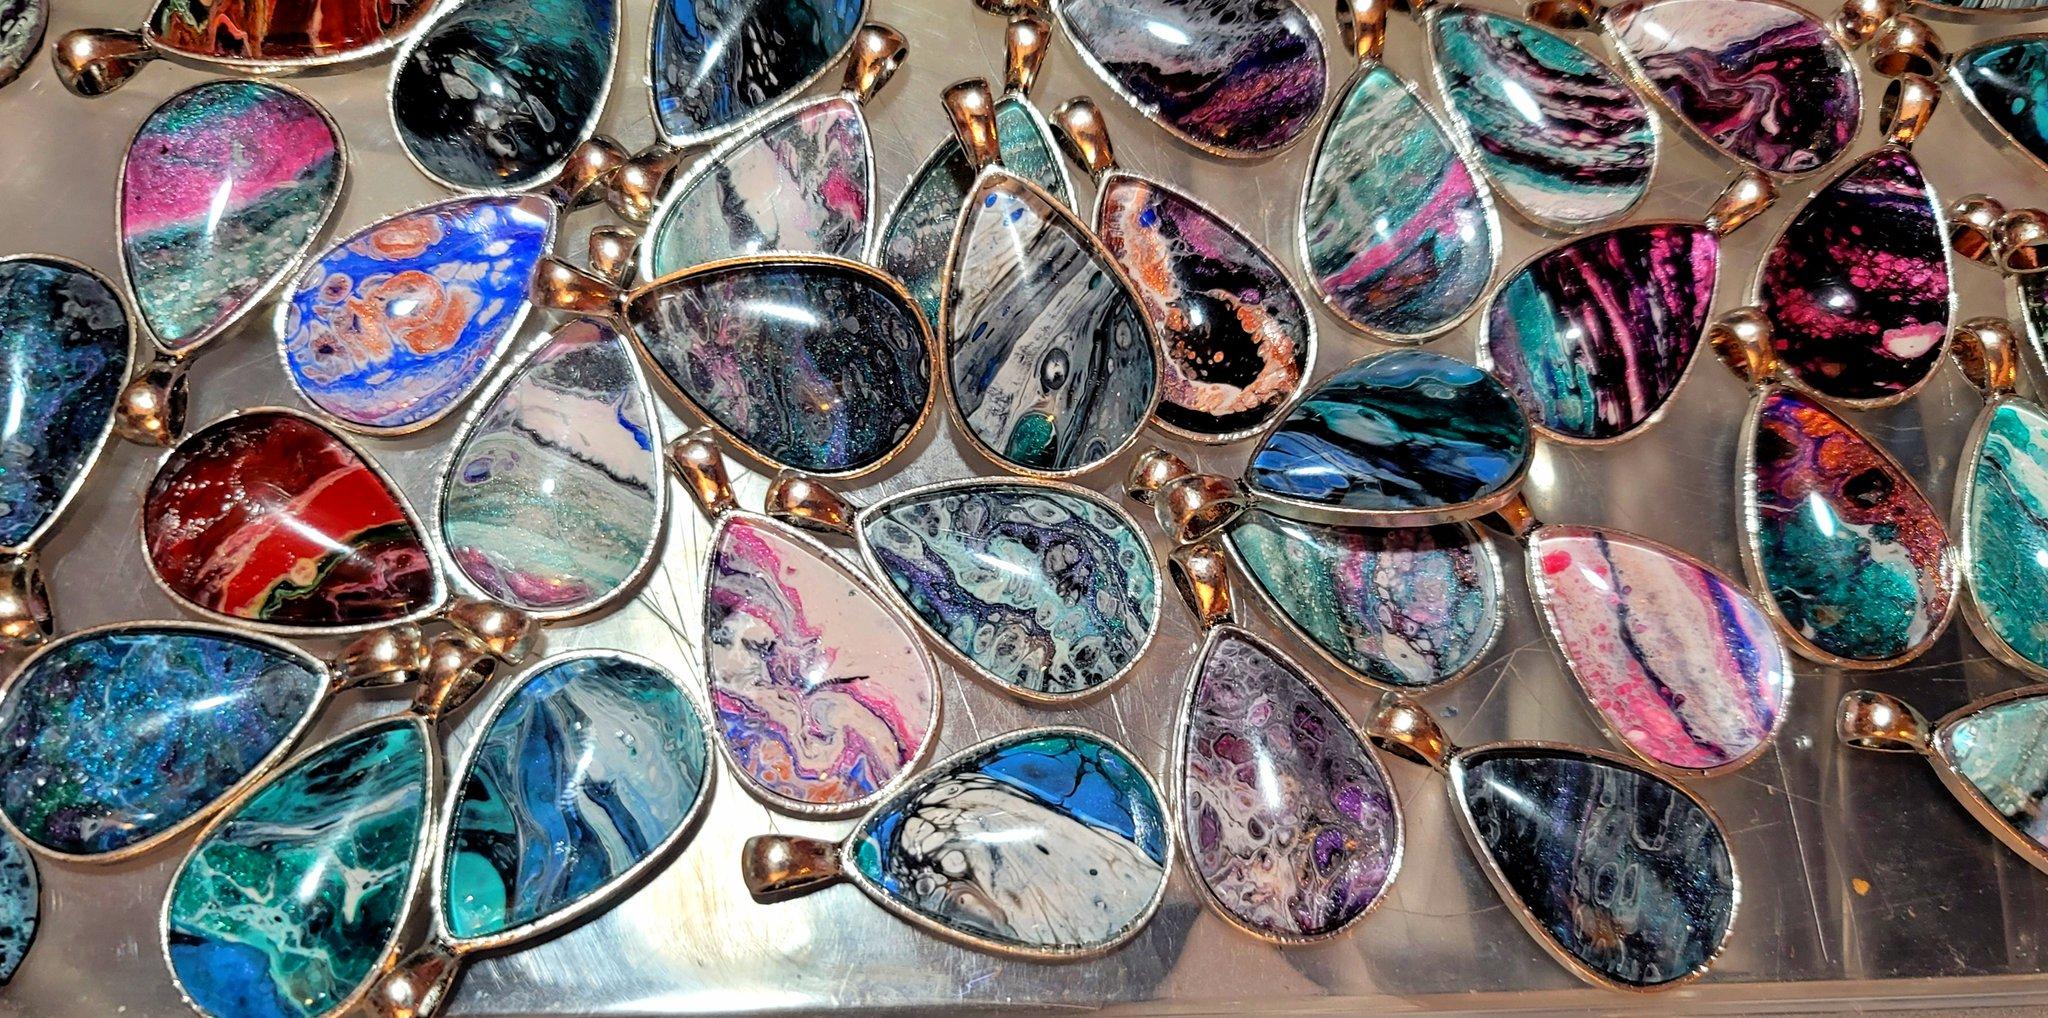 A few dozen teardrop pendants with acrylic pour designs